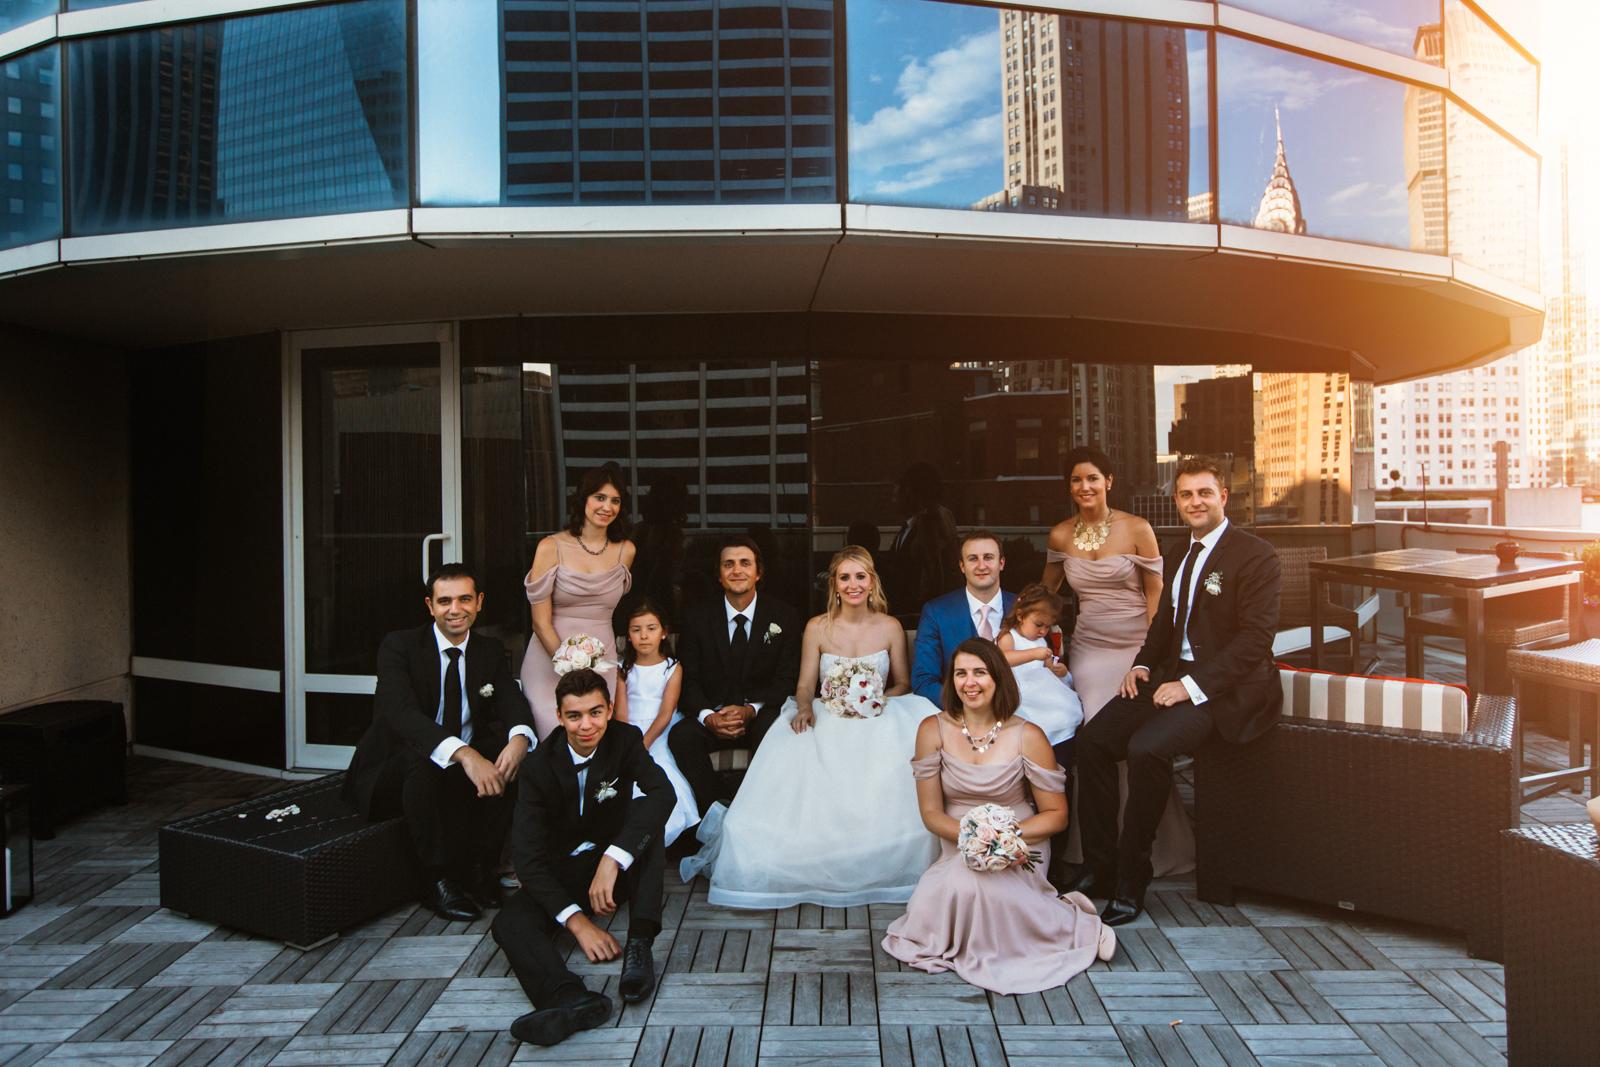 NYC Wedding Photography Sofitel Central Park Brooklyn Photographer Boris Zaretsky _B2C2831-Edit.jpg